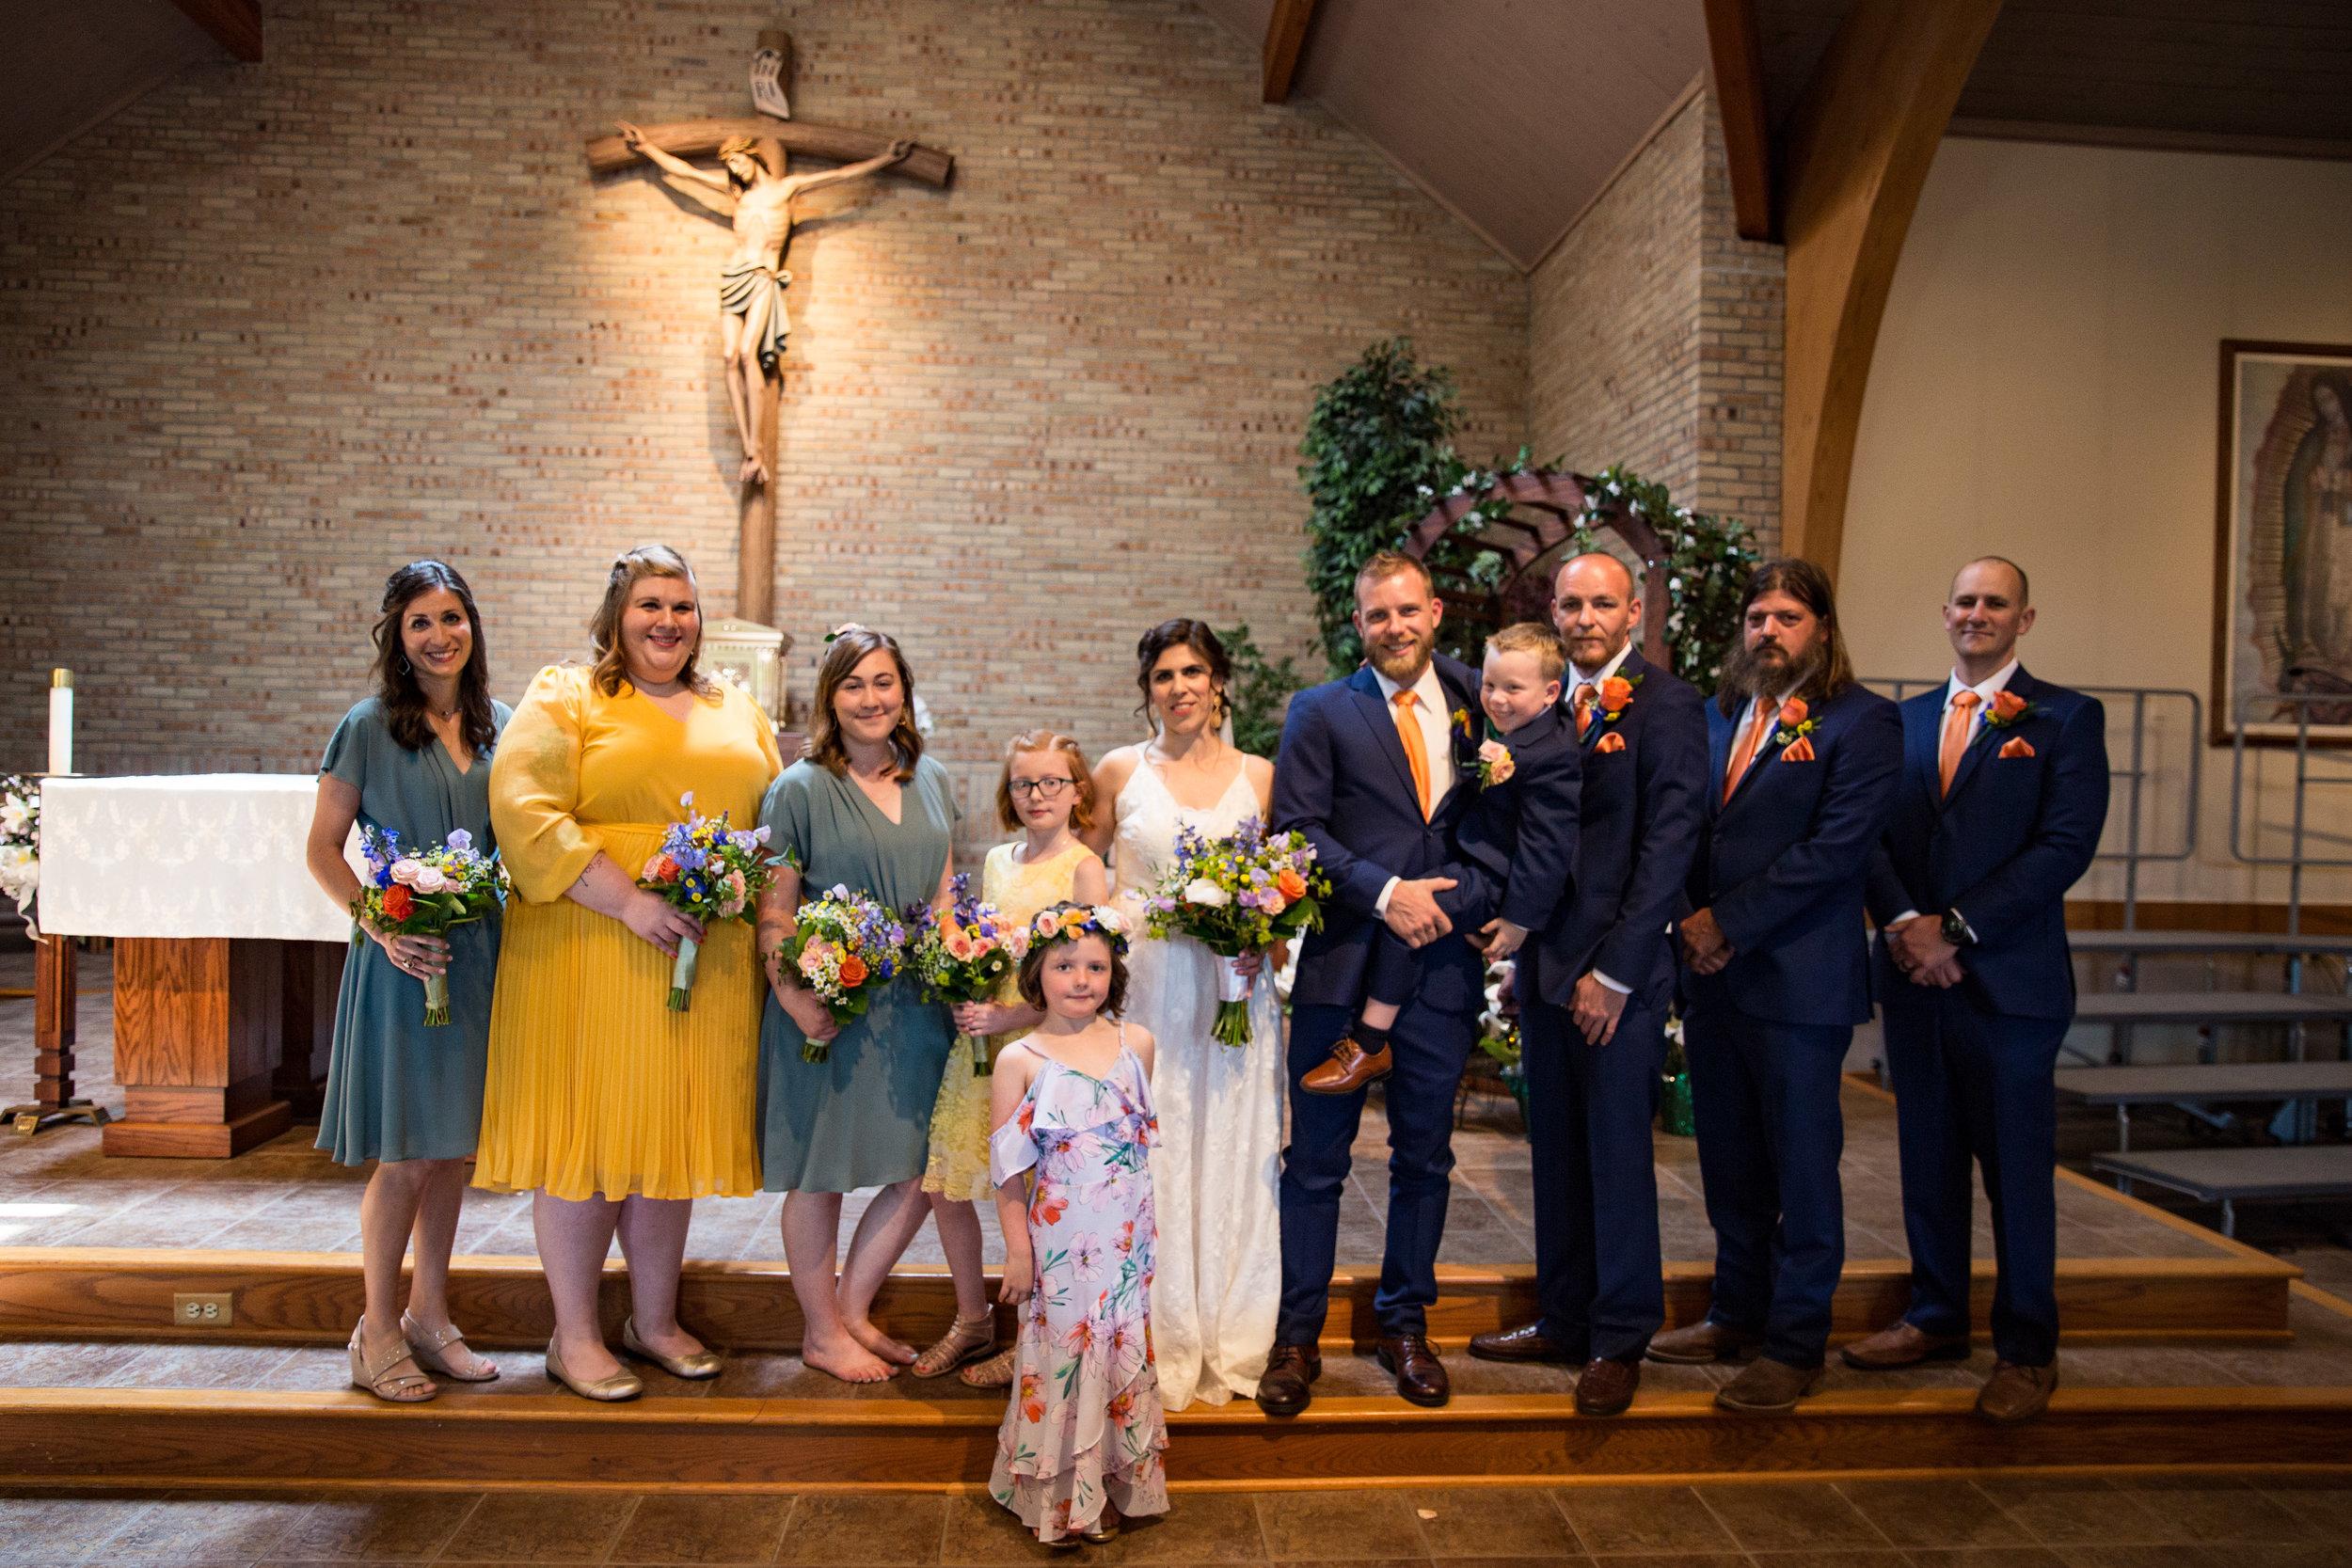 Natalie and Dallas Mooney Wedding 6-8-19_Tania Watt Photography-206.jpg